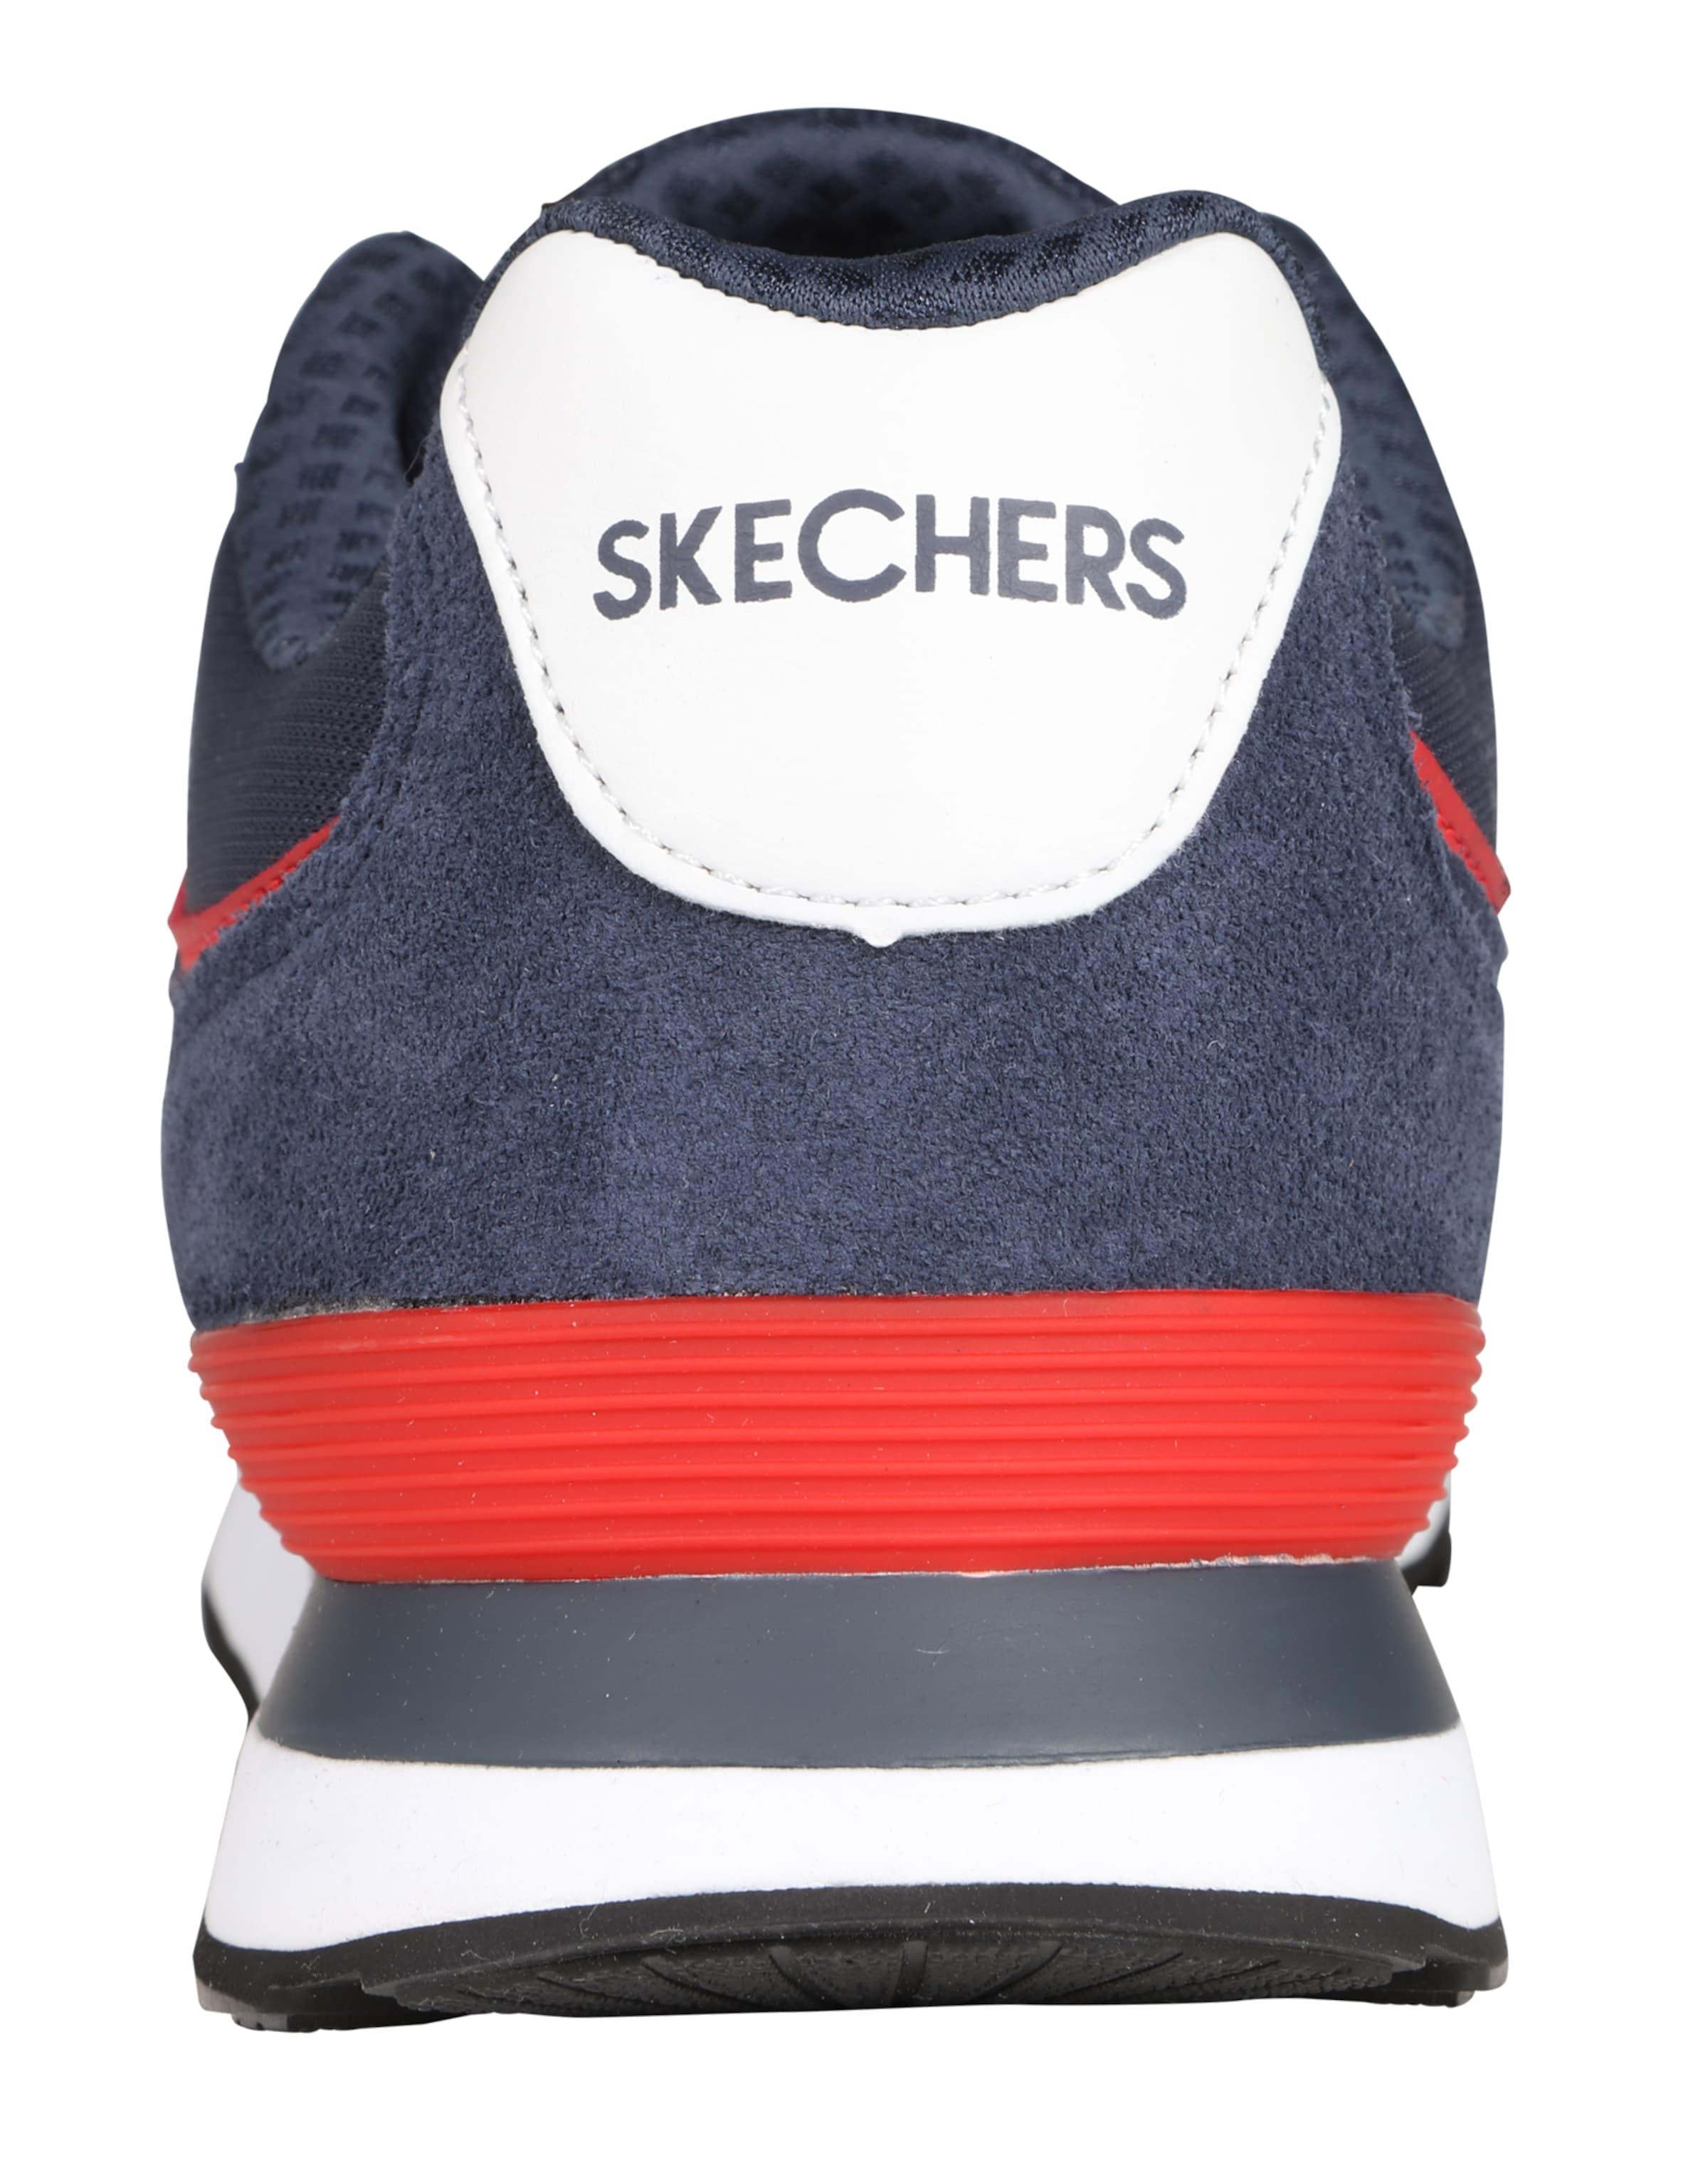 SKECHERS SKECHERS SKECHERS Turnschuhe Leder, Textil Wilde Freizeitschuhe 1a9f3f